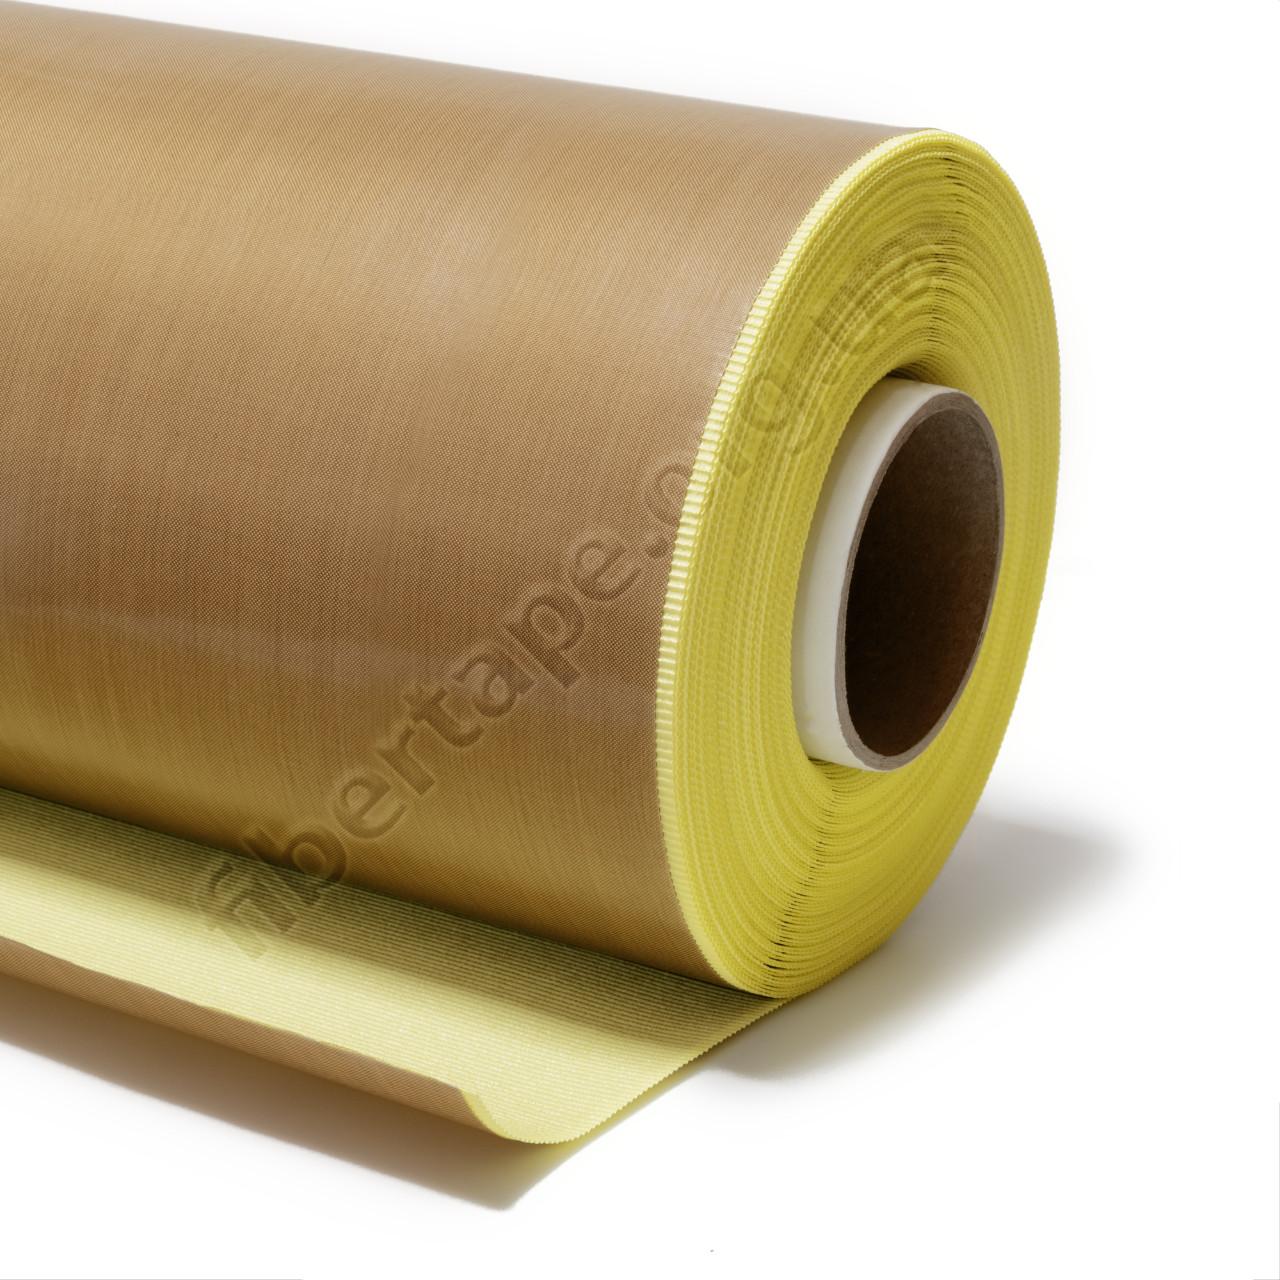 Тефлоновая лента (пленка) с клеем 220 микрон